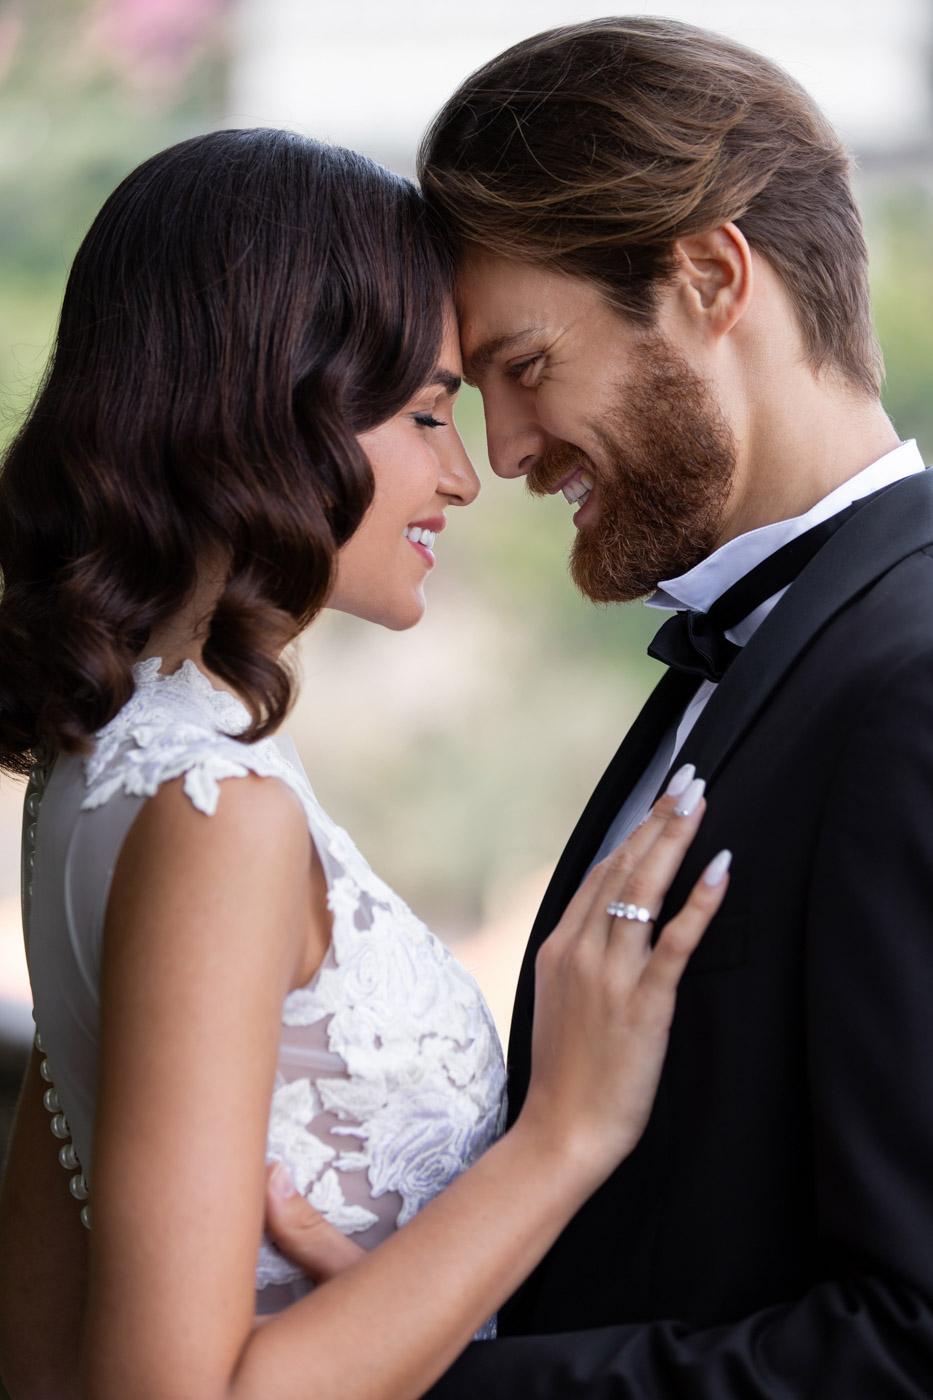 Wedding couple at Villa Astor, Sorrento, Italy - photo by Adagion Studio